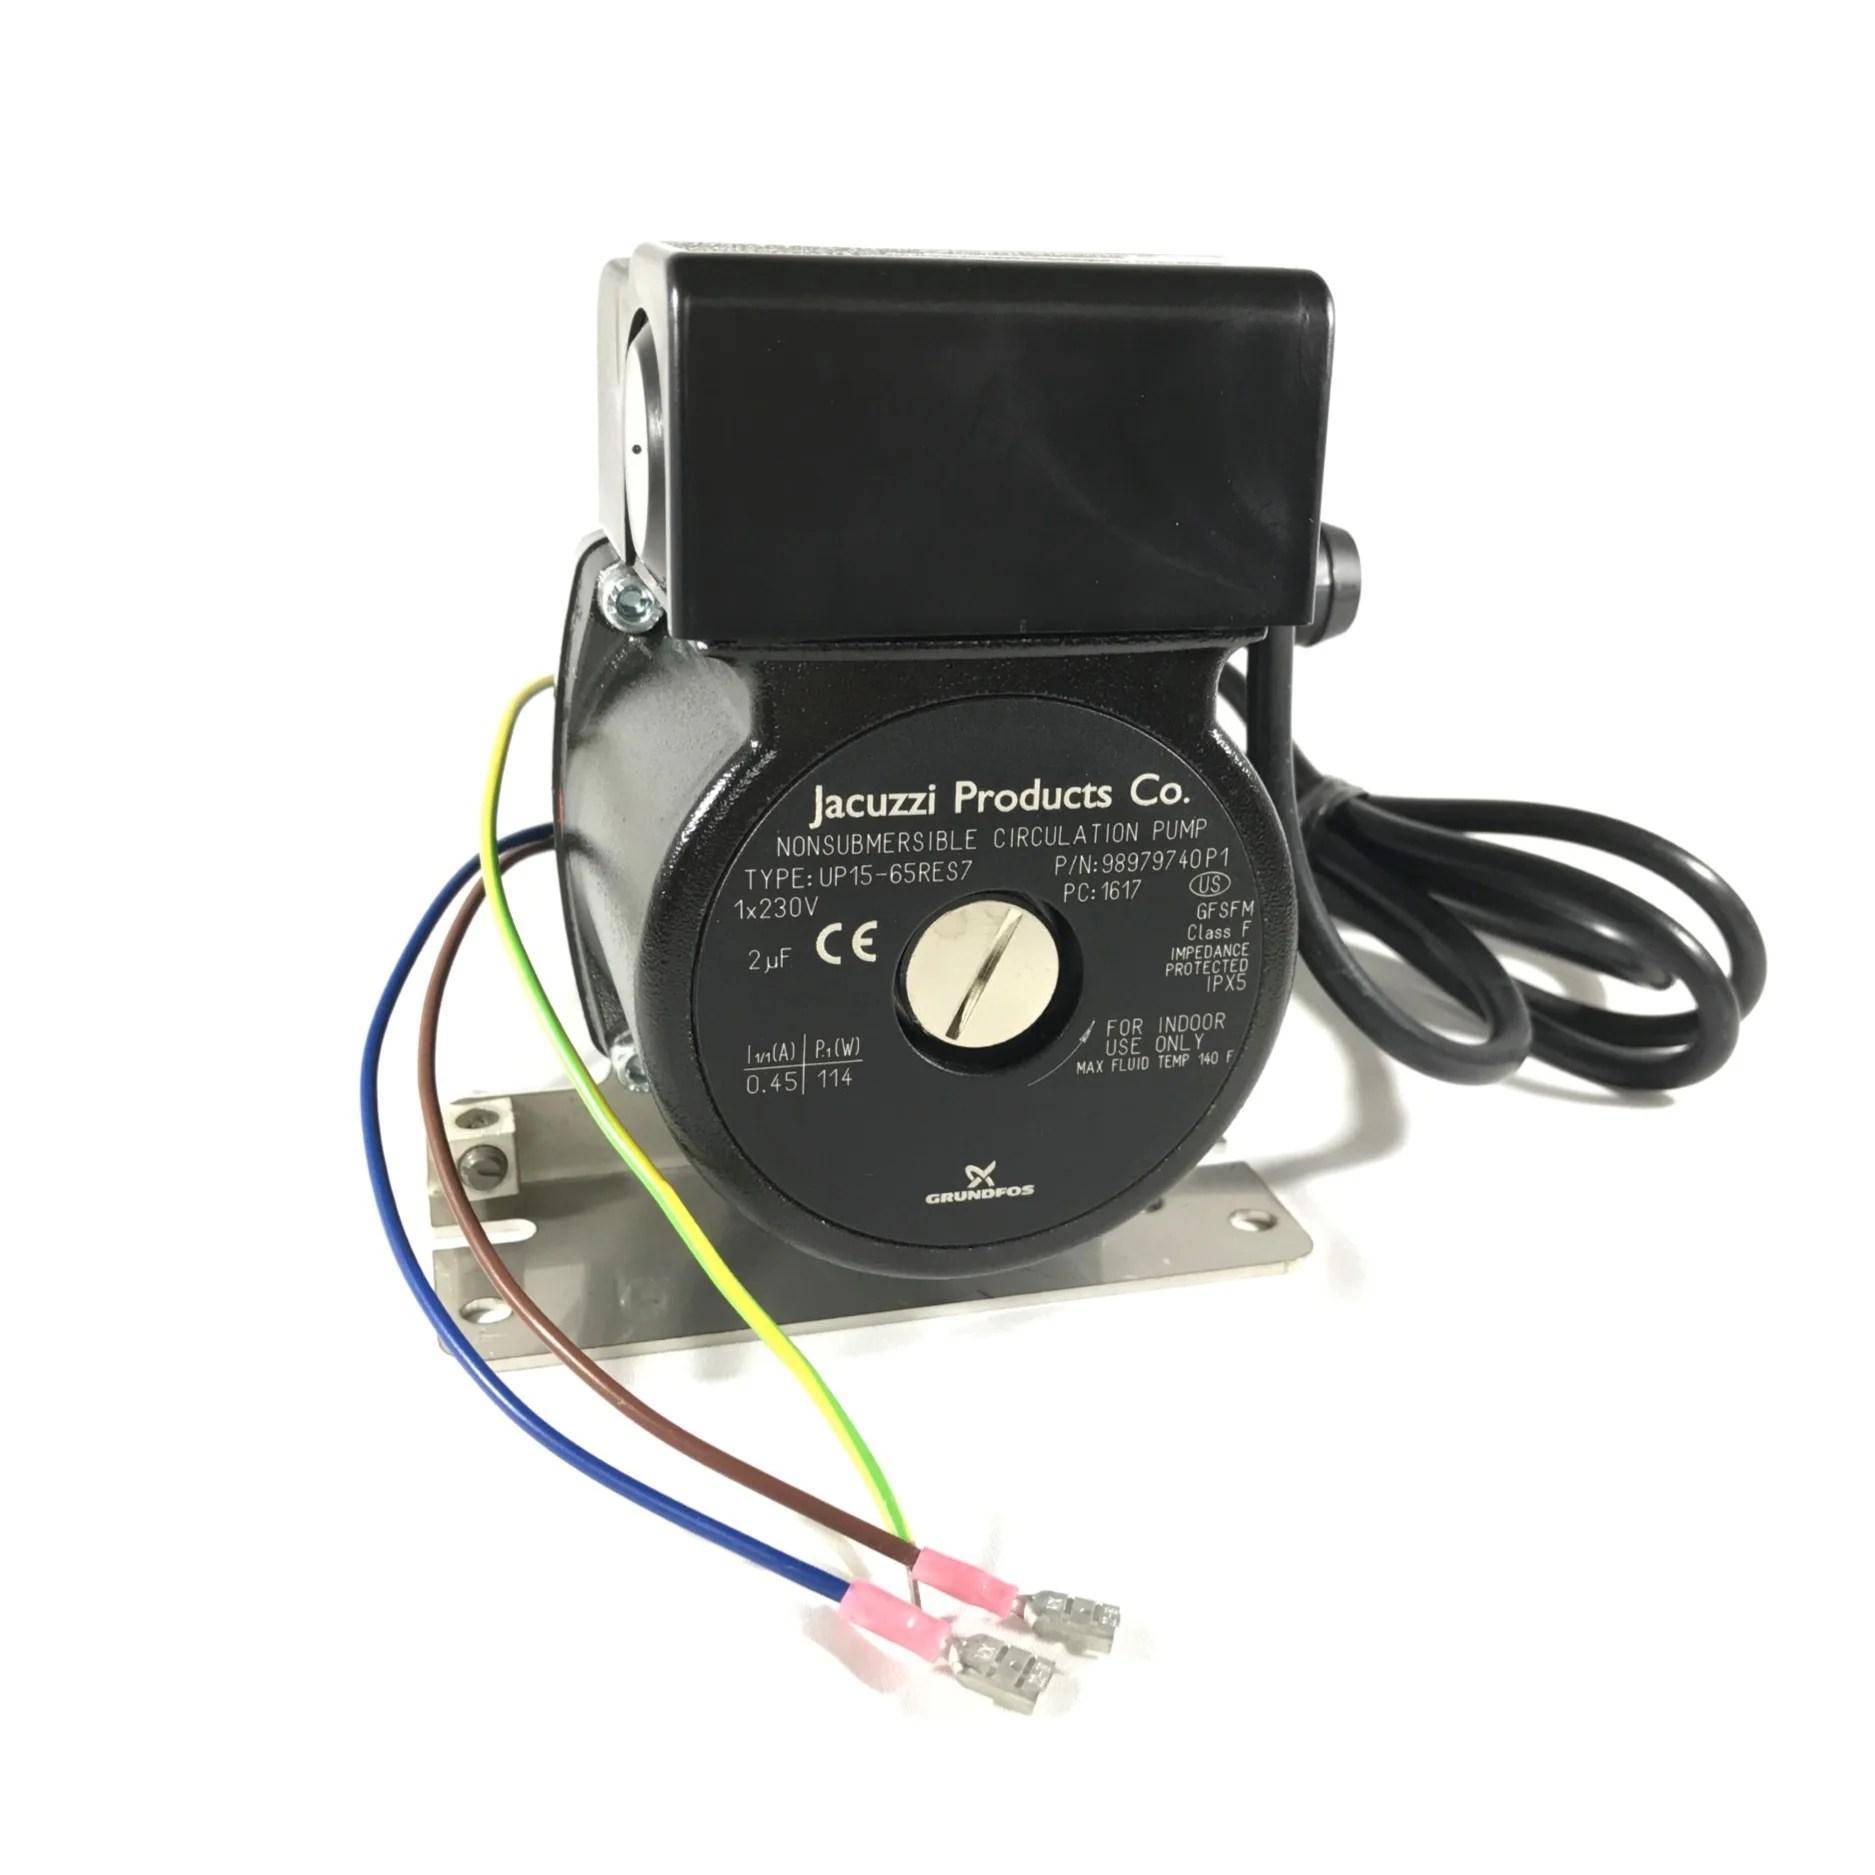 small resolution of jacuzzi hot tub circulation pump 240vac 50hz part no 6000 125